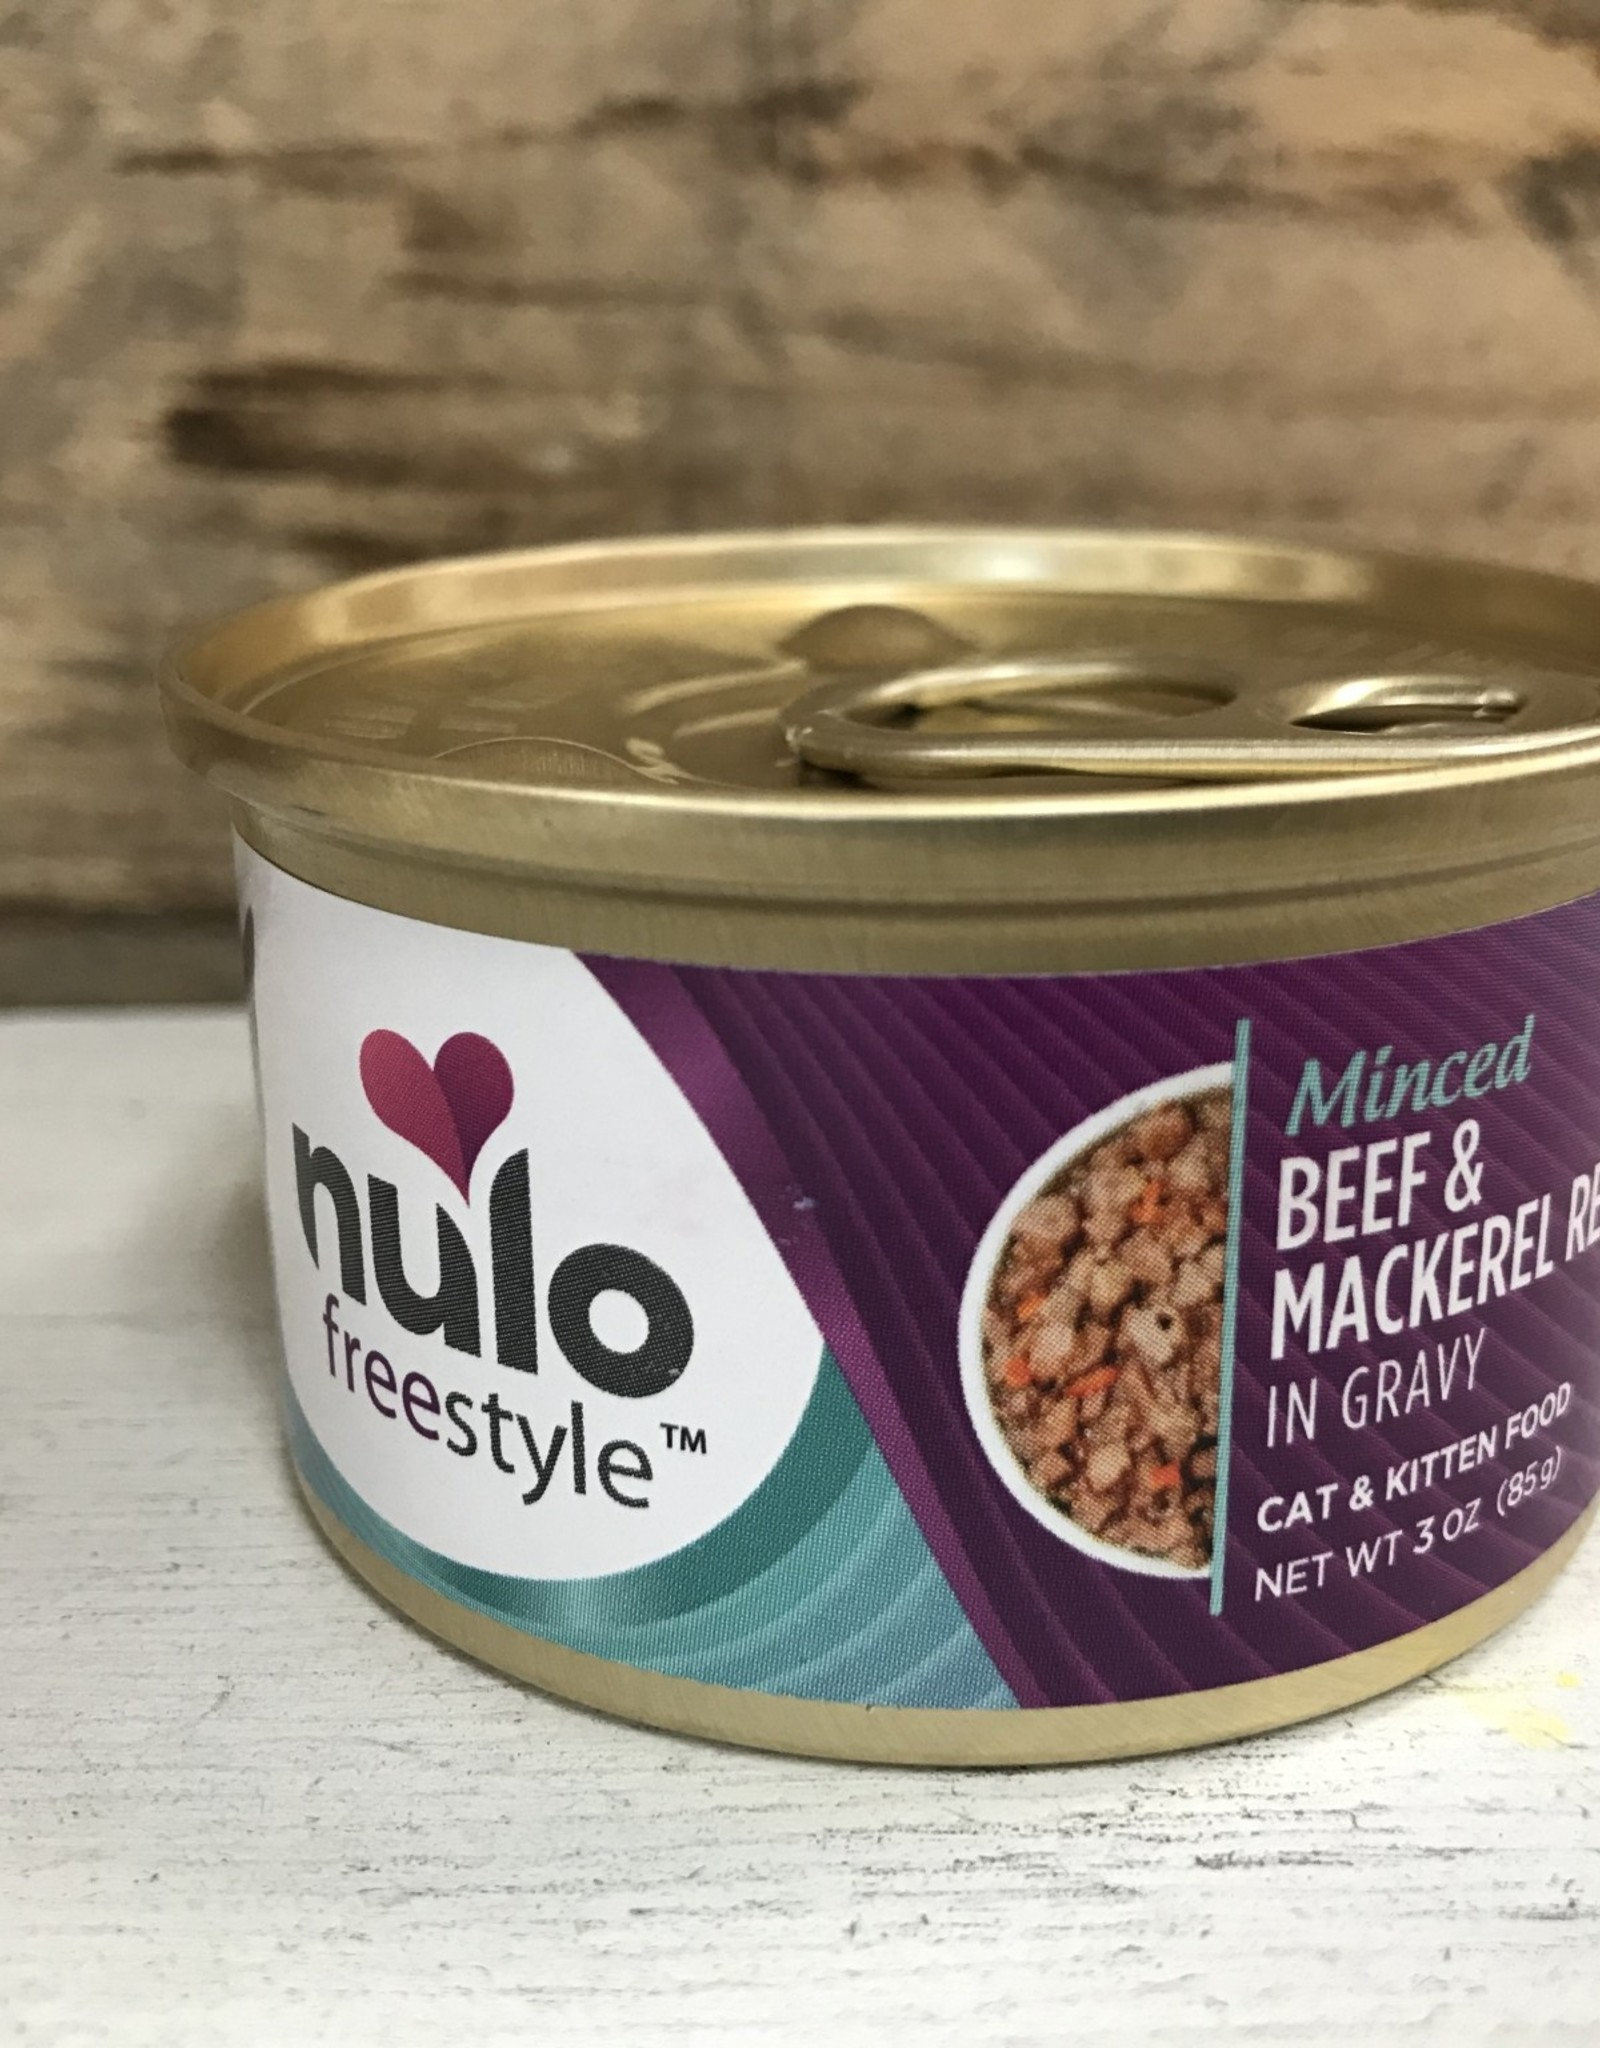 Nulo Nulo FreeStyle 3oz GF Cat Minced Beef & Mackerel in Gravy can